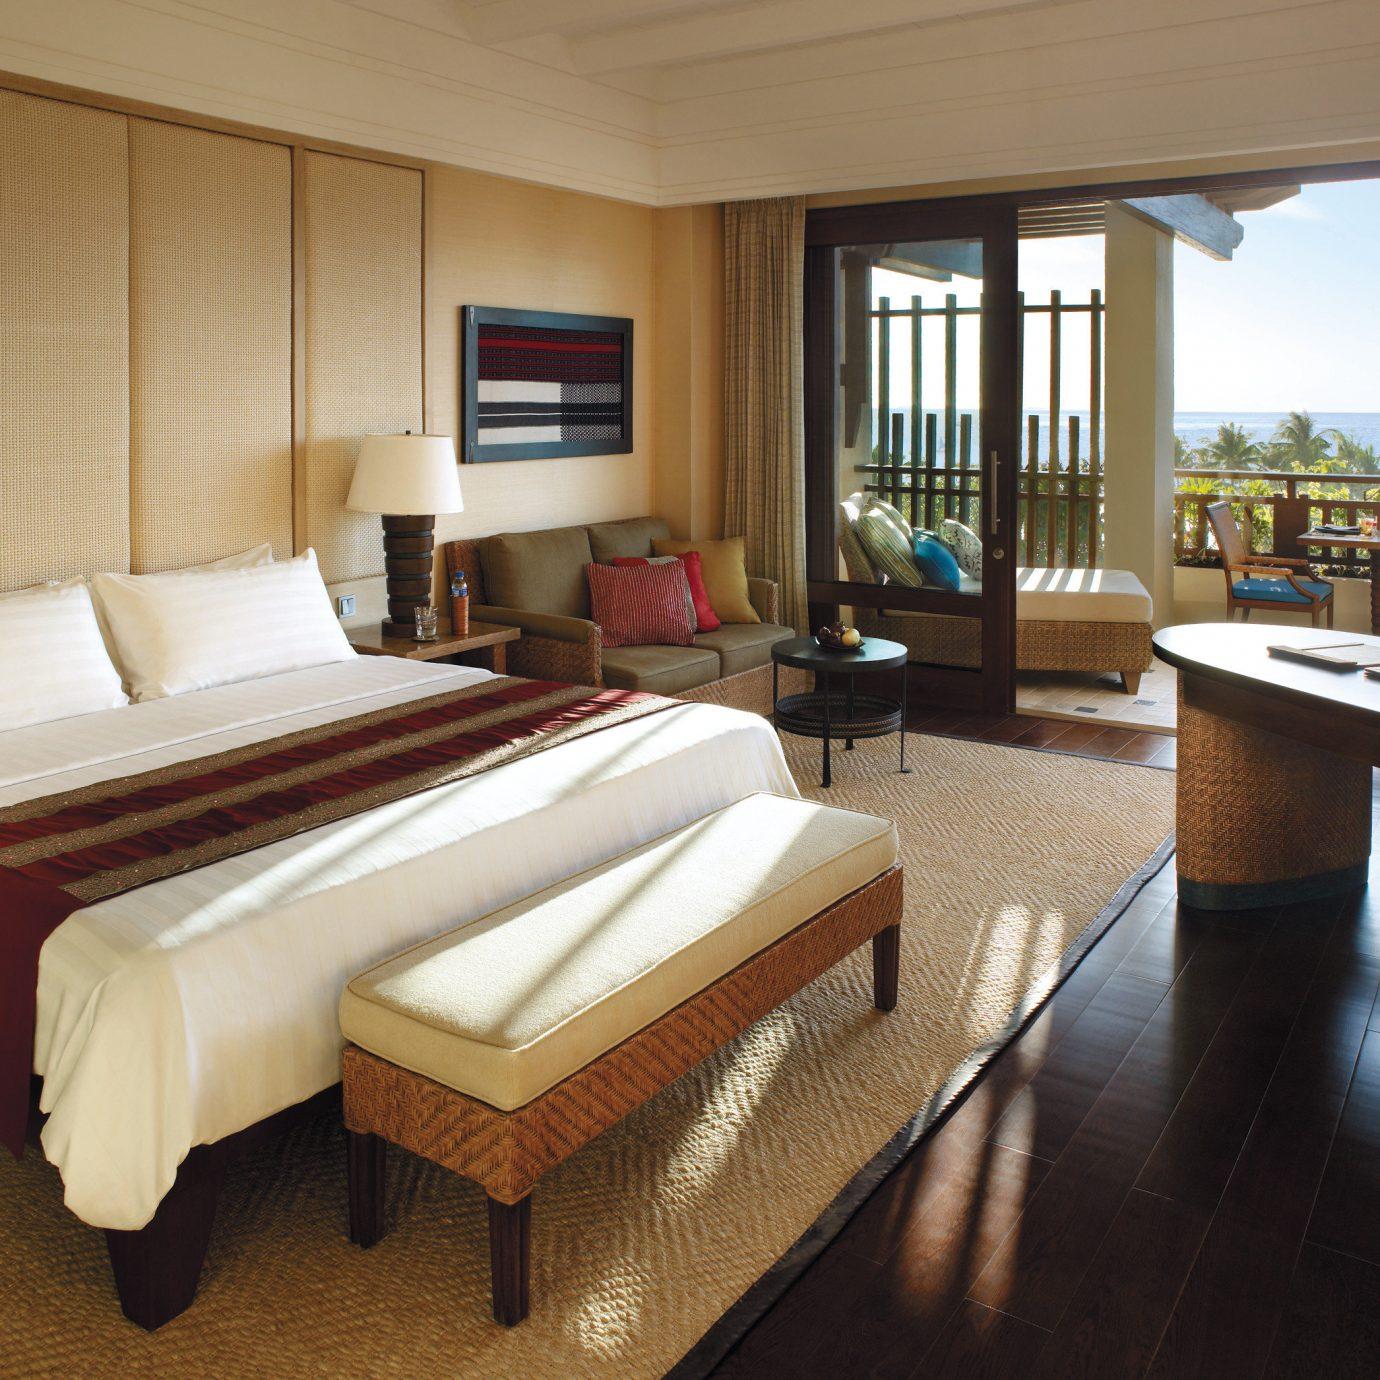 Balcony Bedroom Family Patio Resort property Suite condominium Villa living room